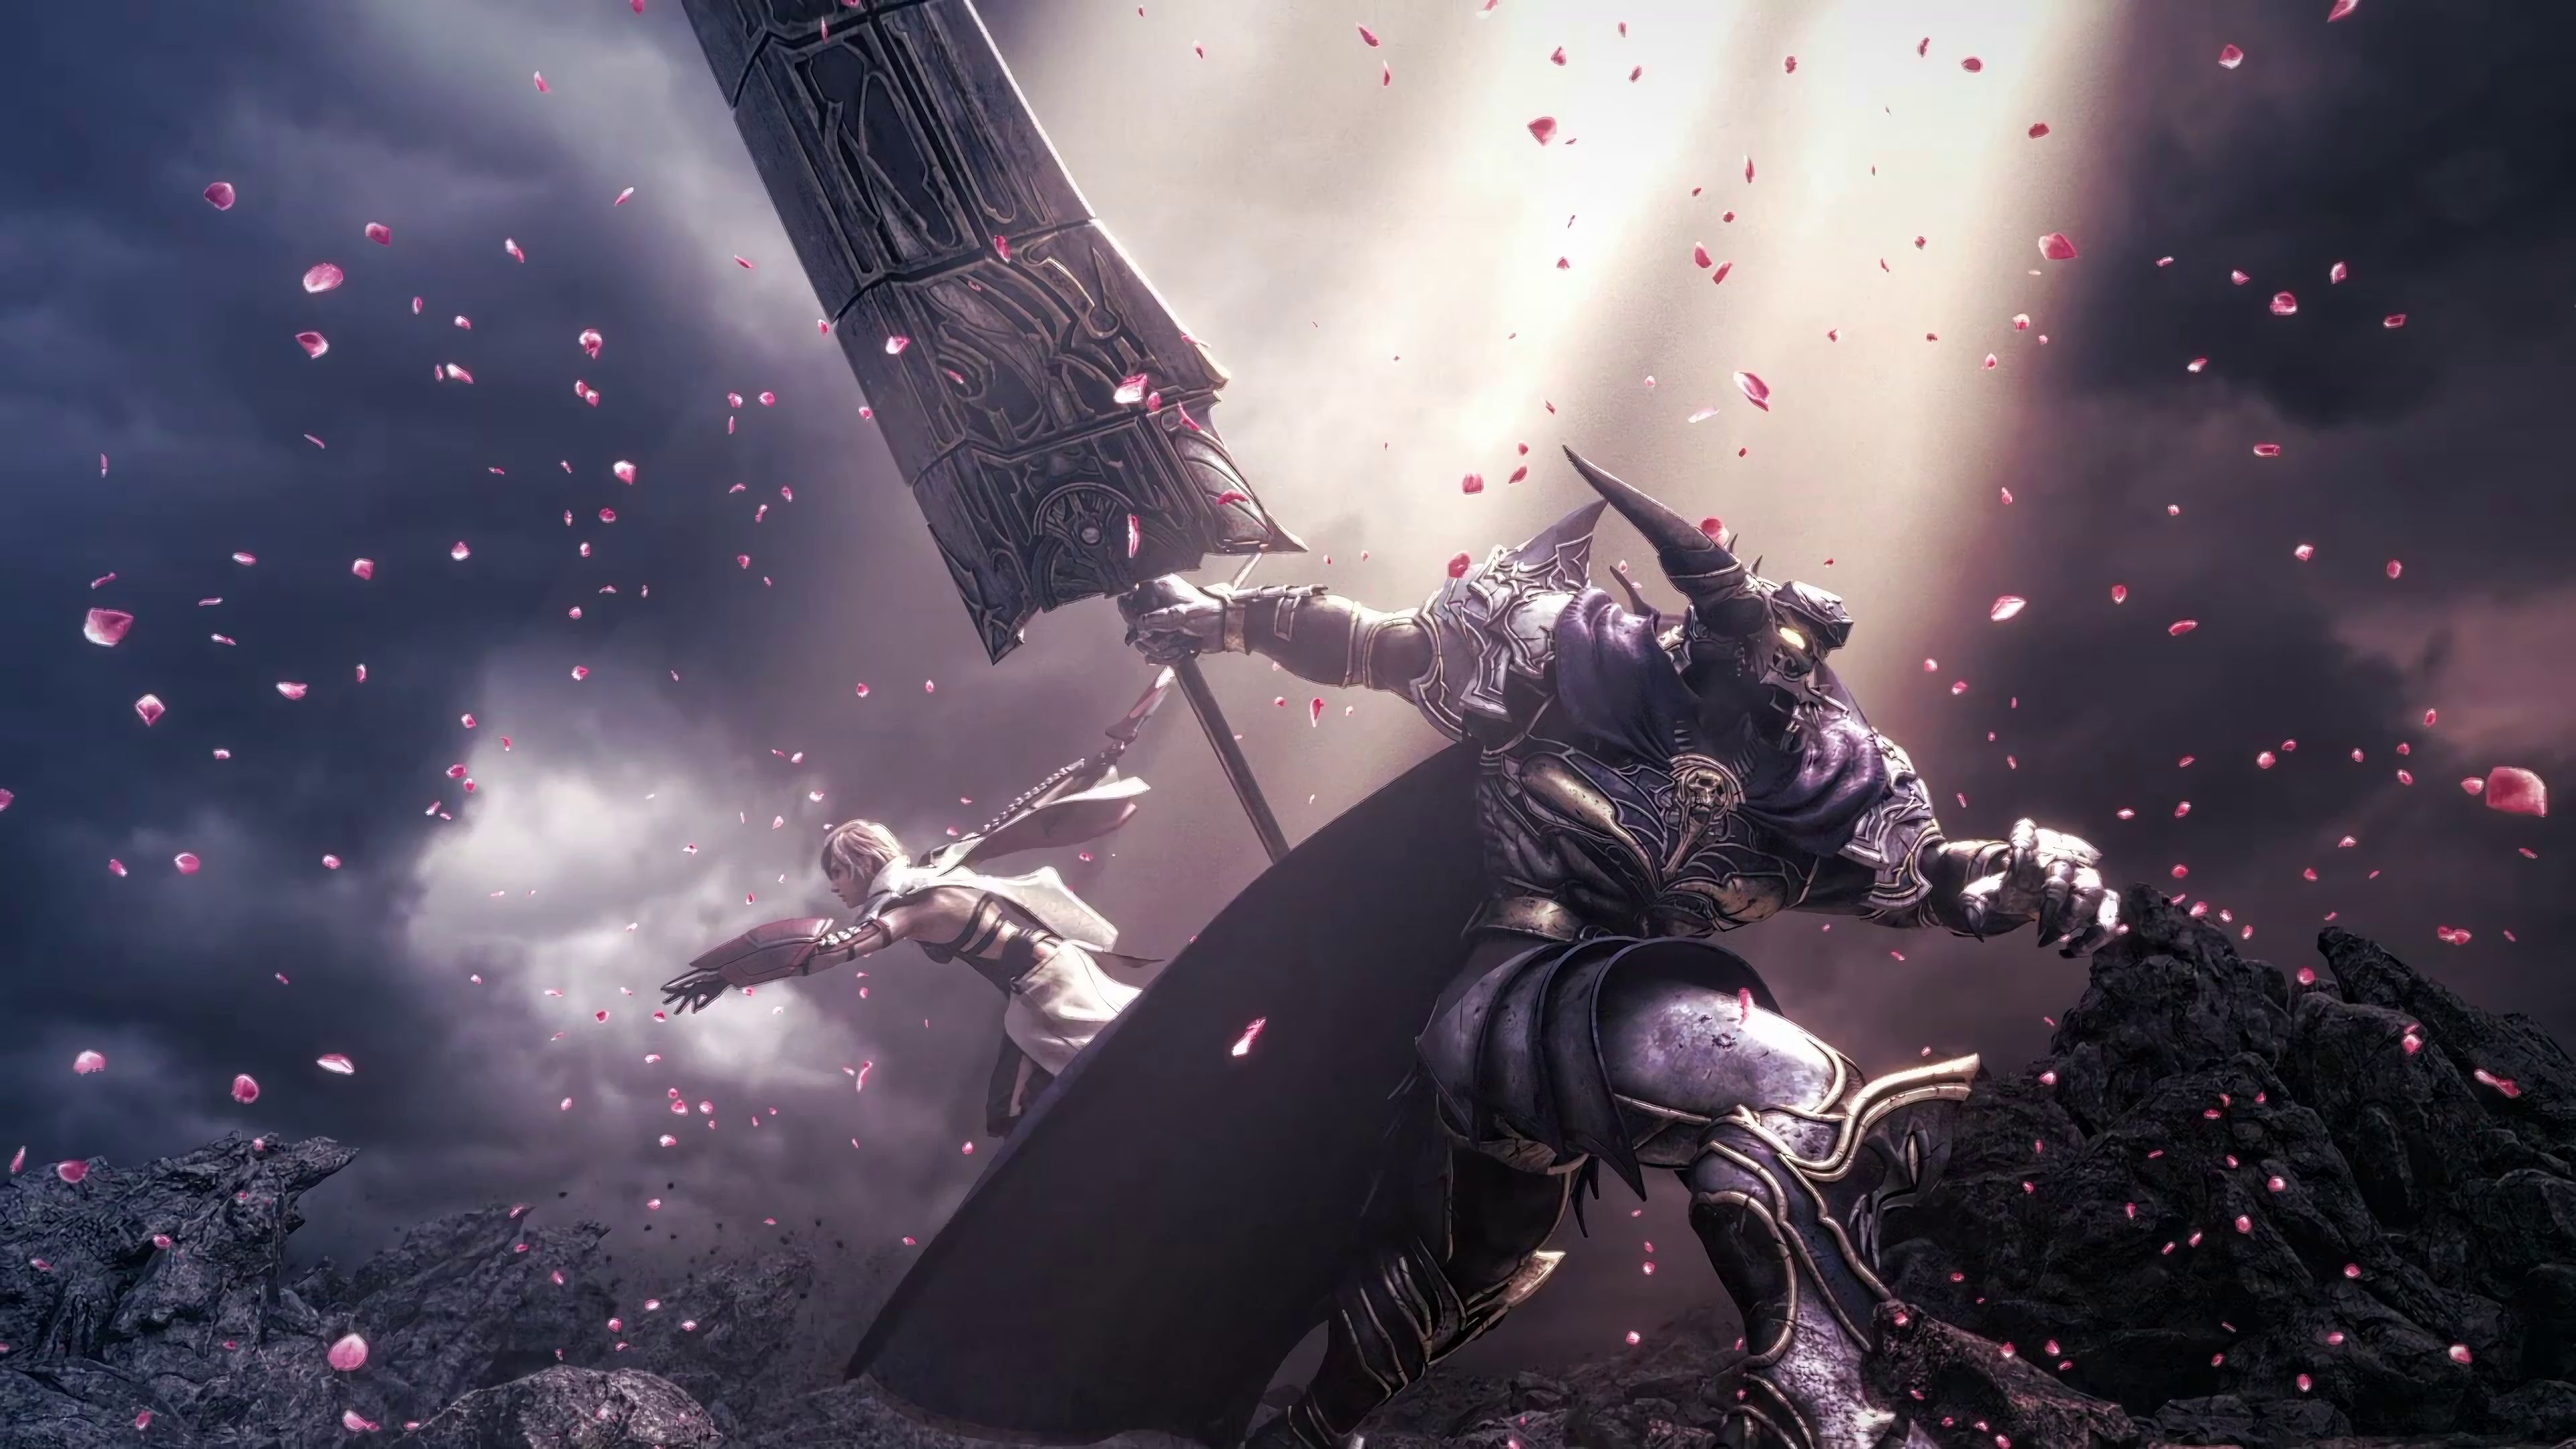 Final Fantasy 4k Wallpapers Top Free Final Fantasy 4k Backgrounds Wallpaperaccess